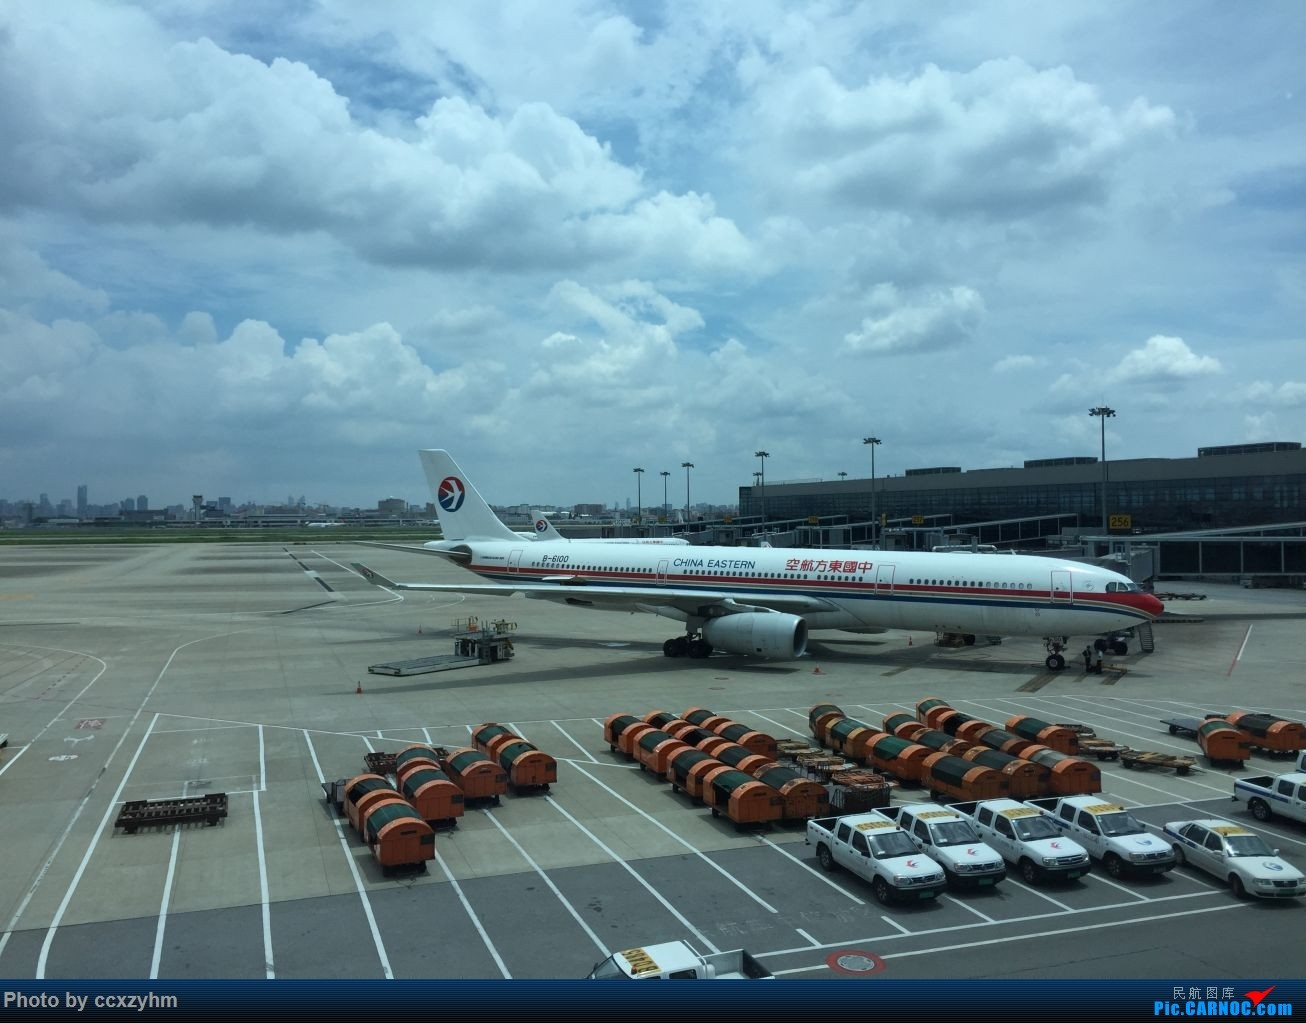 Re:[原创]论坛首发 京沪线上的国航789 高二升高三暑假短Break 空铁联运去北京 AIRBUS A330-300 B-6100 中国上海虹桥国际机场